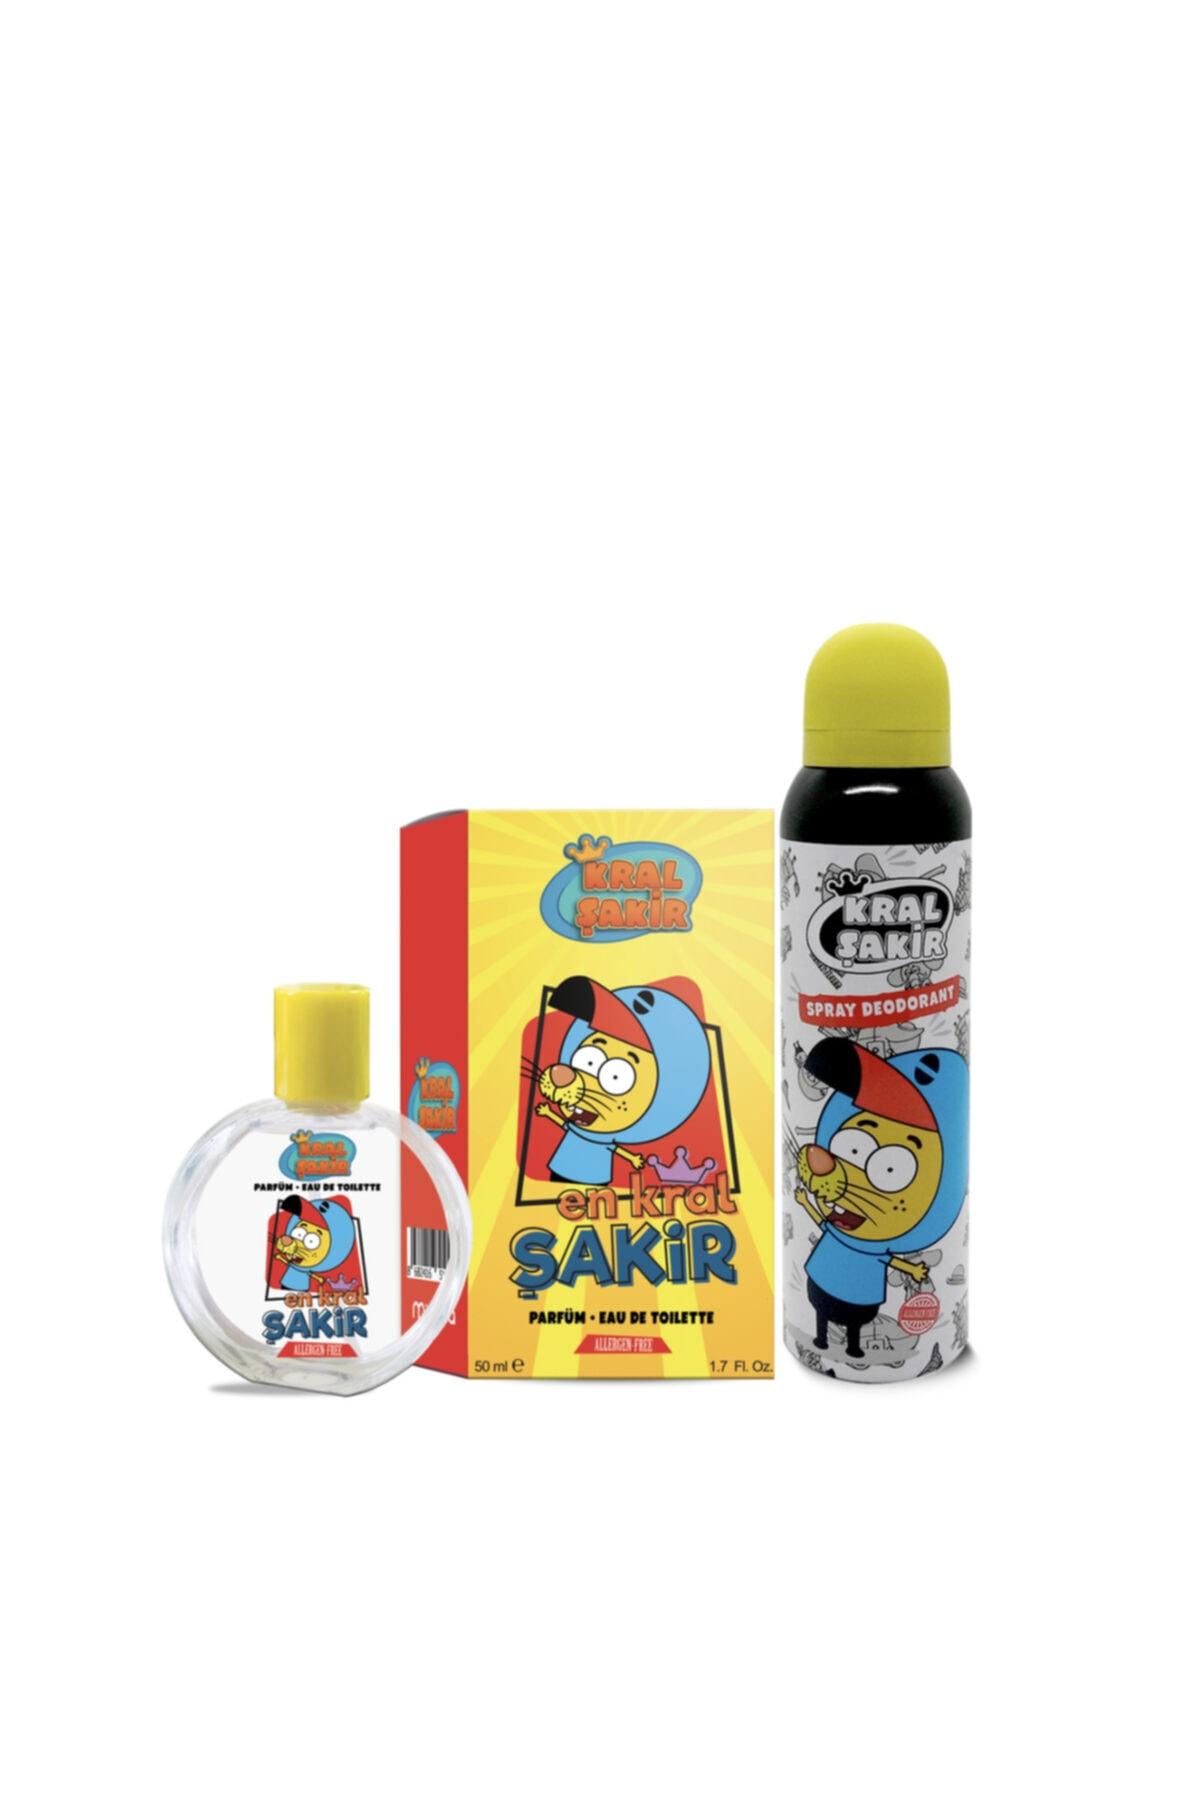 Kral Şakir 50ml Parfüm Edt + 150ml Deodorant 1